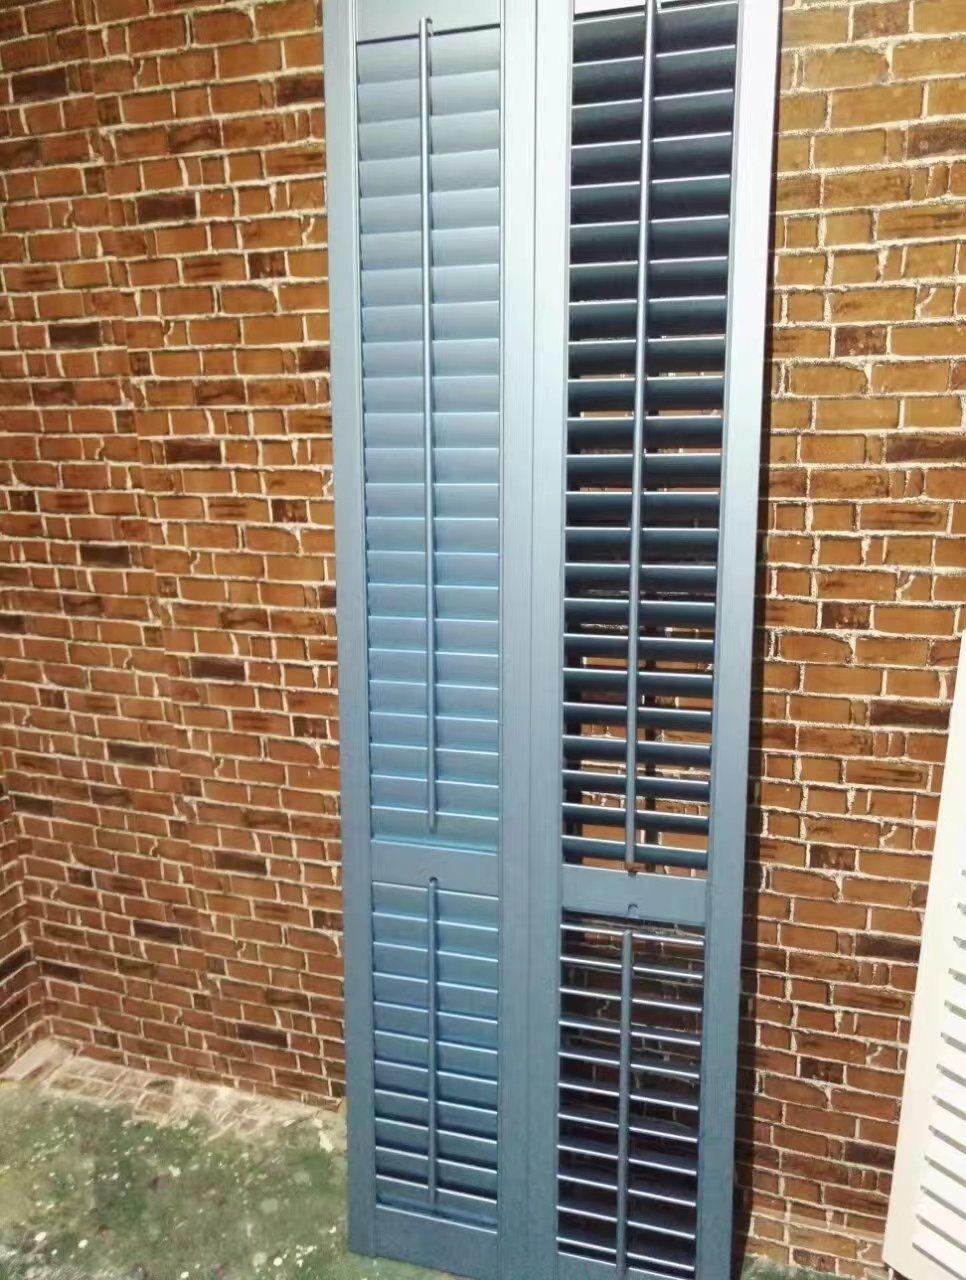 Window Wooden Shutter Painted Blue Color Standard Tilt Rod